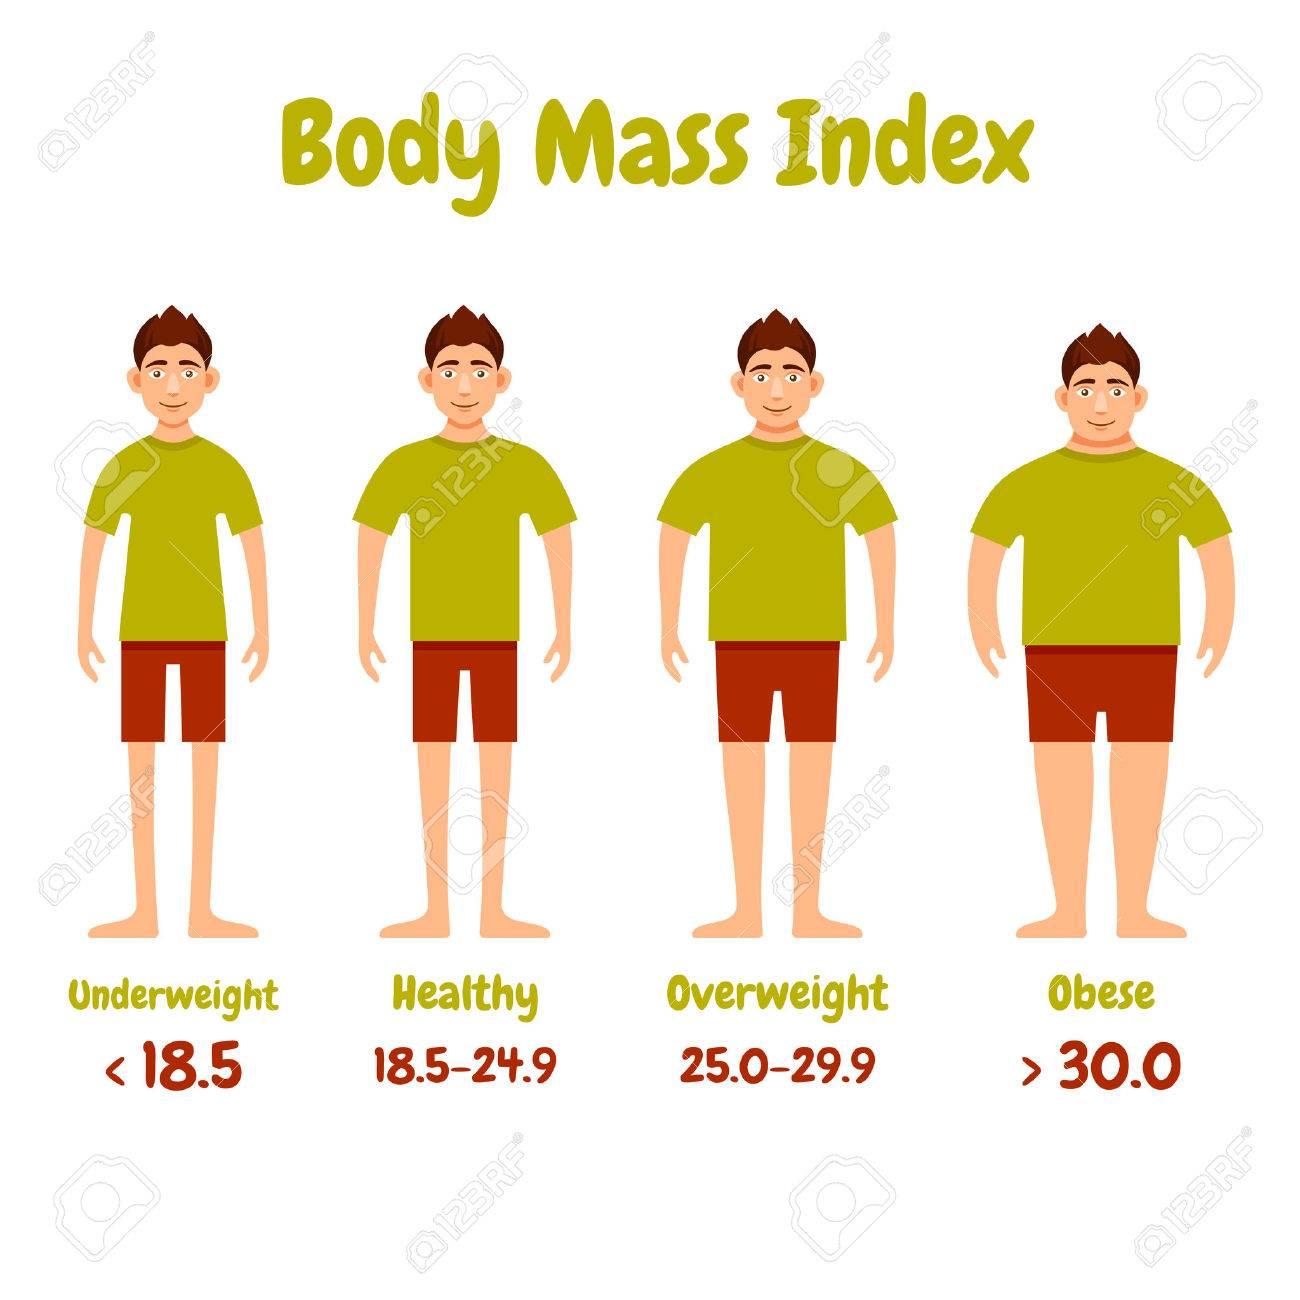 Männer bodyindex Der Bodymassindex